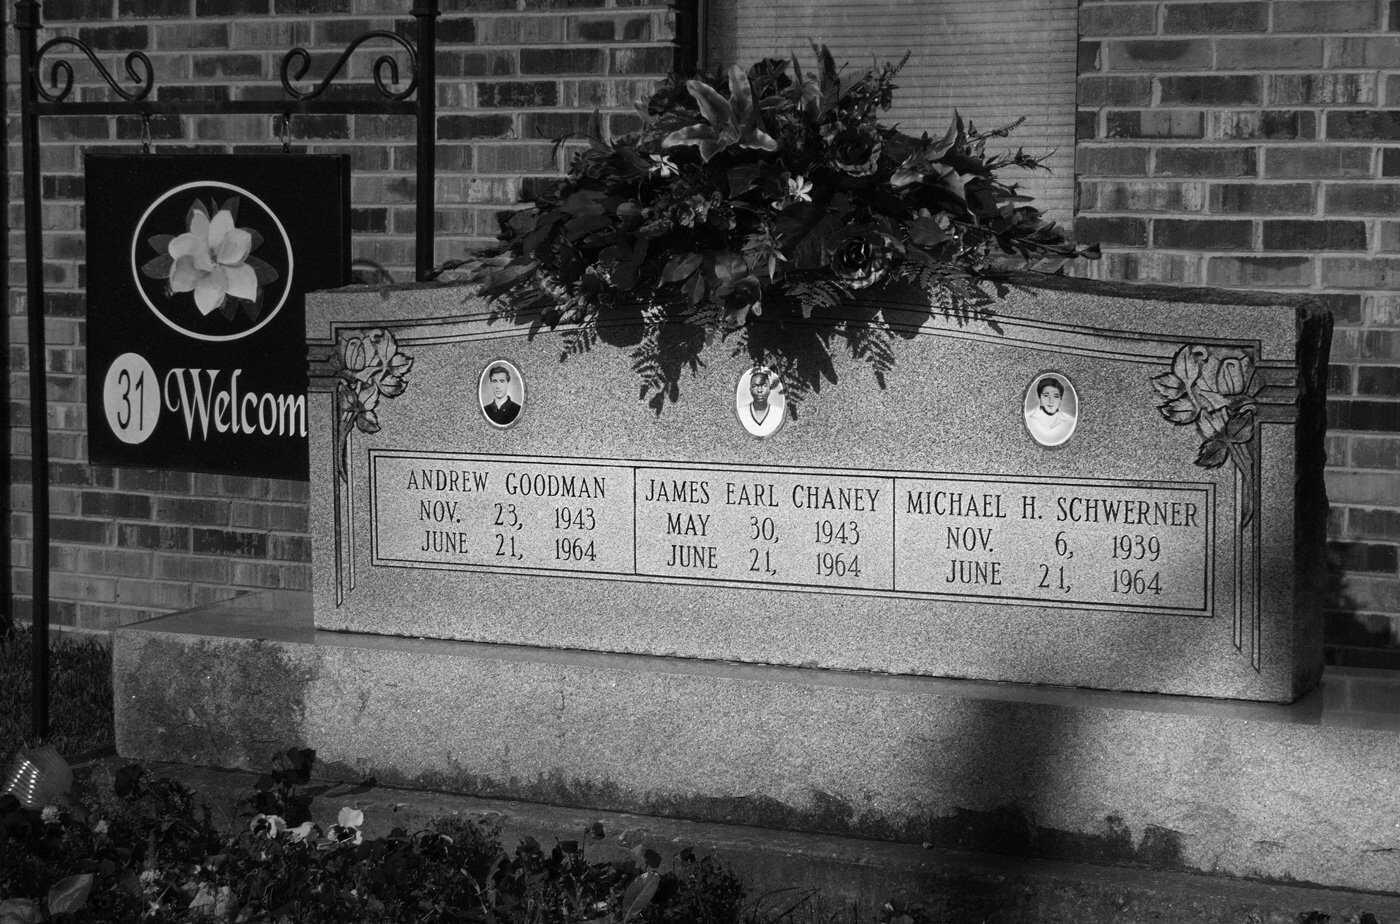 Remembering-black-and-white_Goodman-Chaney-Schwerner-Memorial.jpg